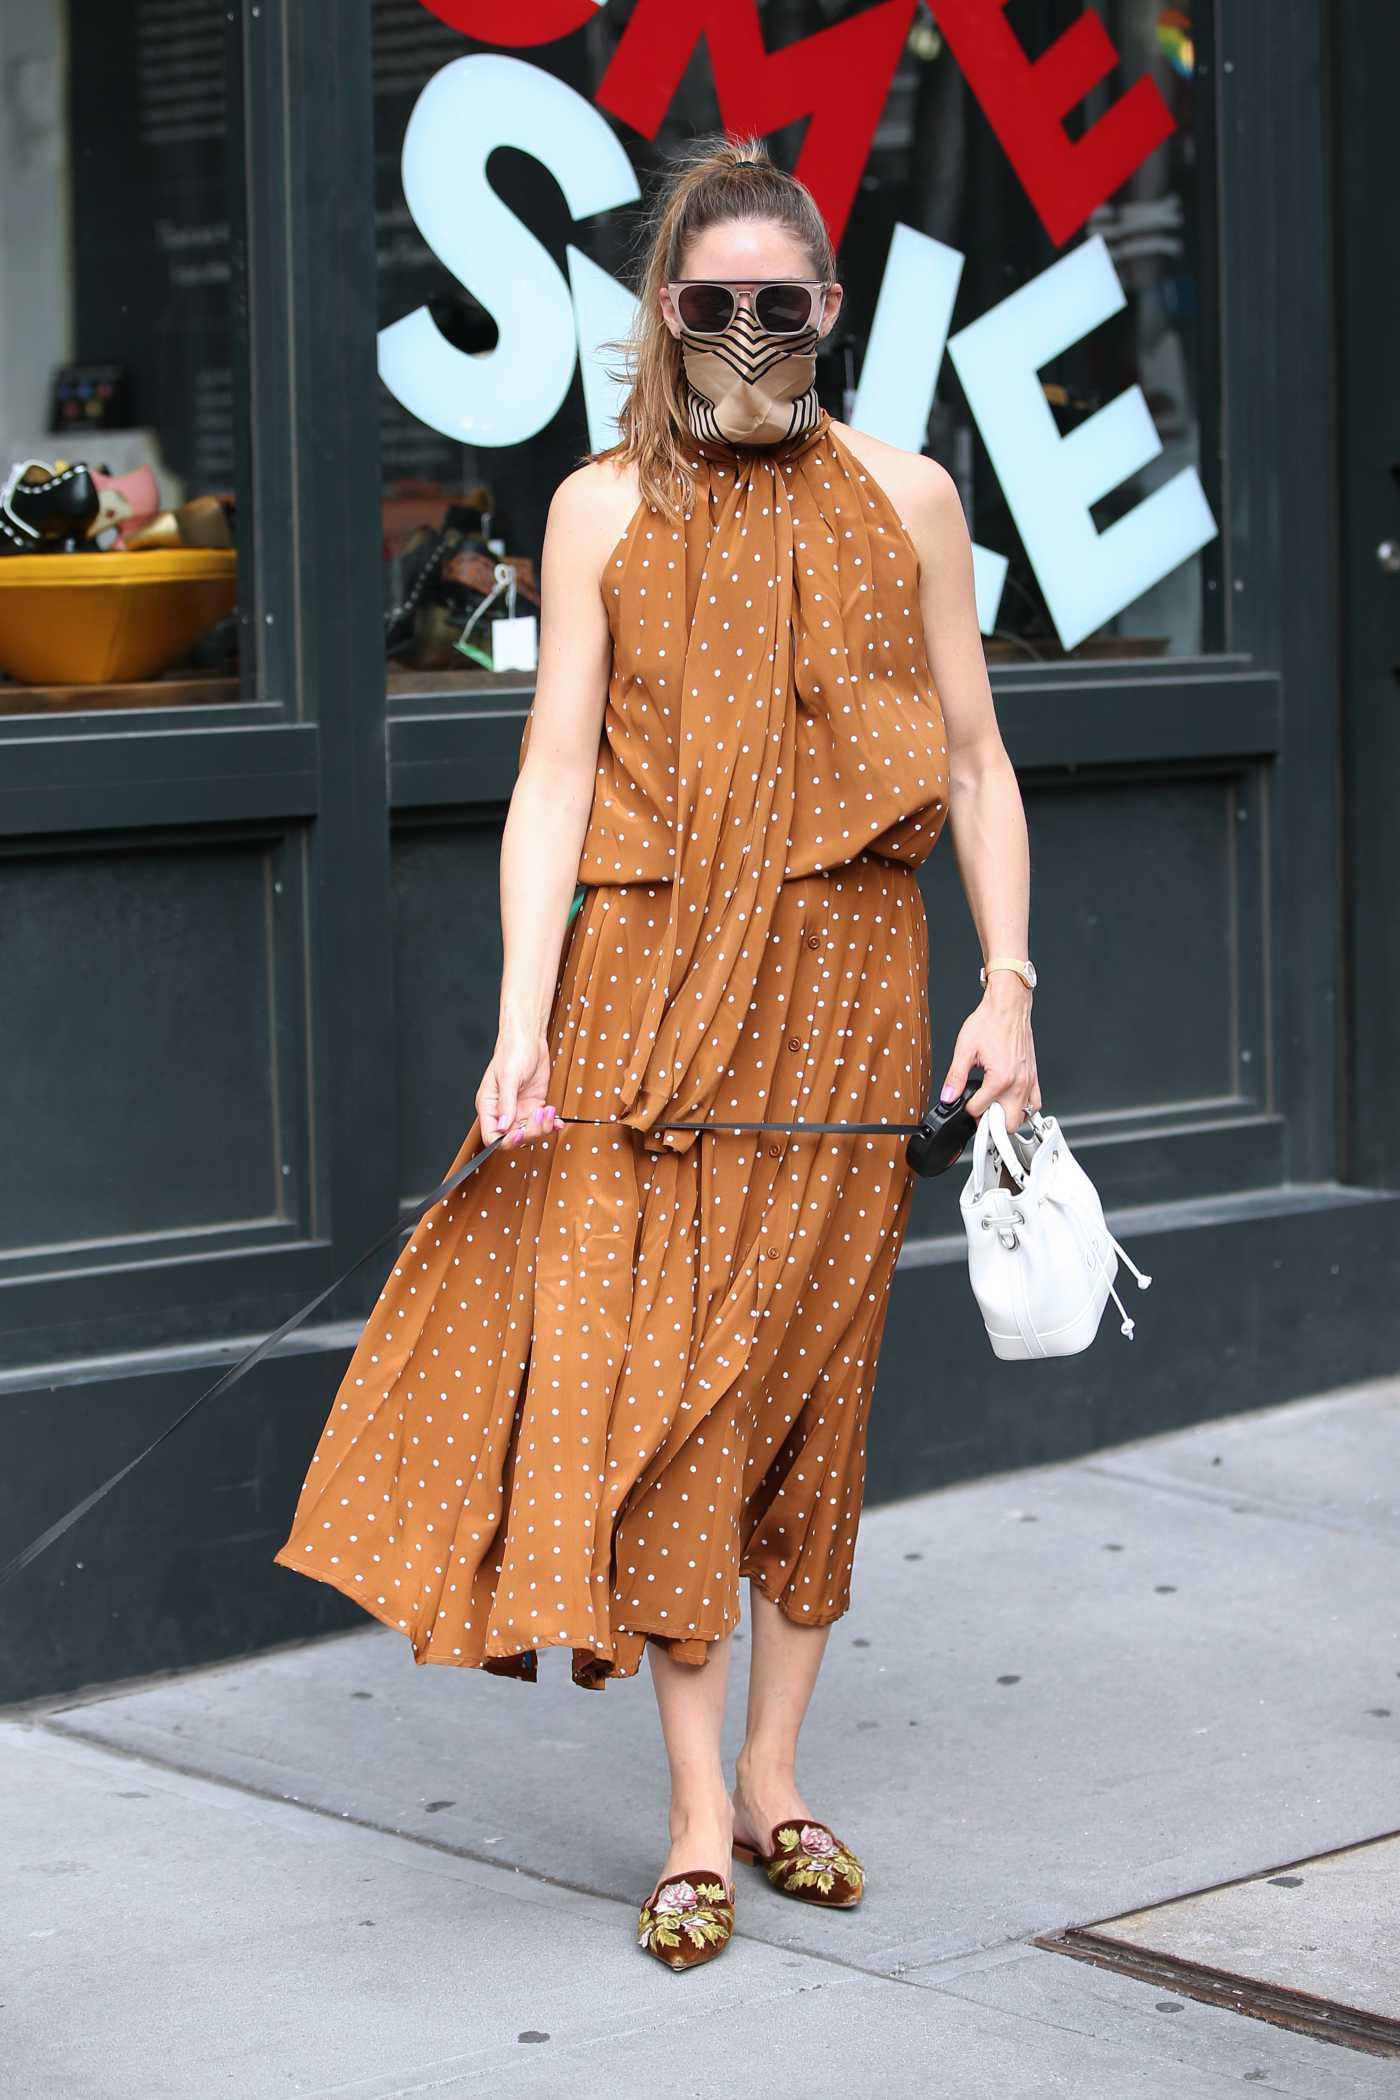 Olivia Palermo in a Tan Polka Dot Dress Walks Her Dog in New York 07/23/2020